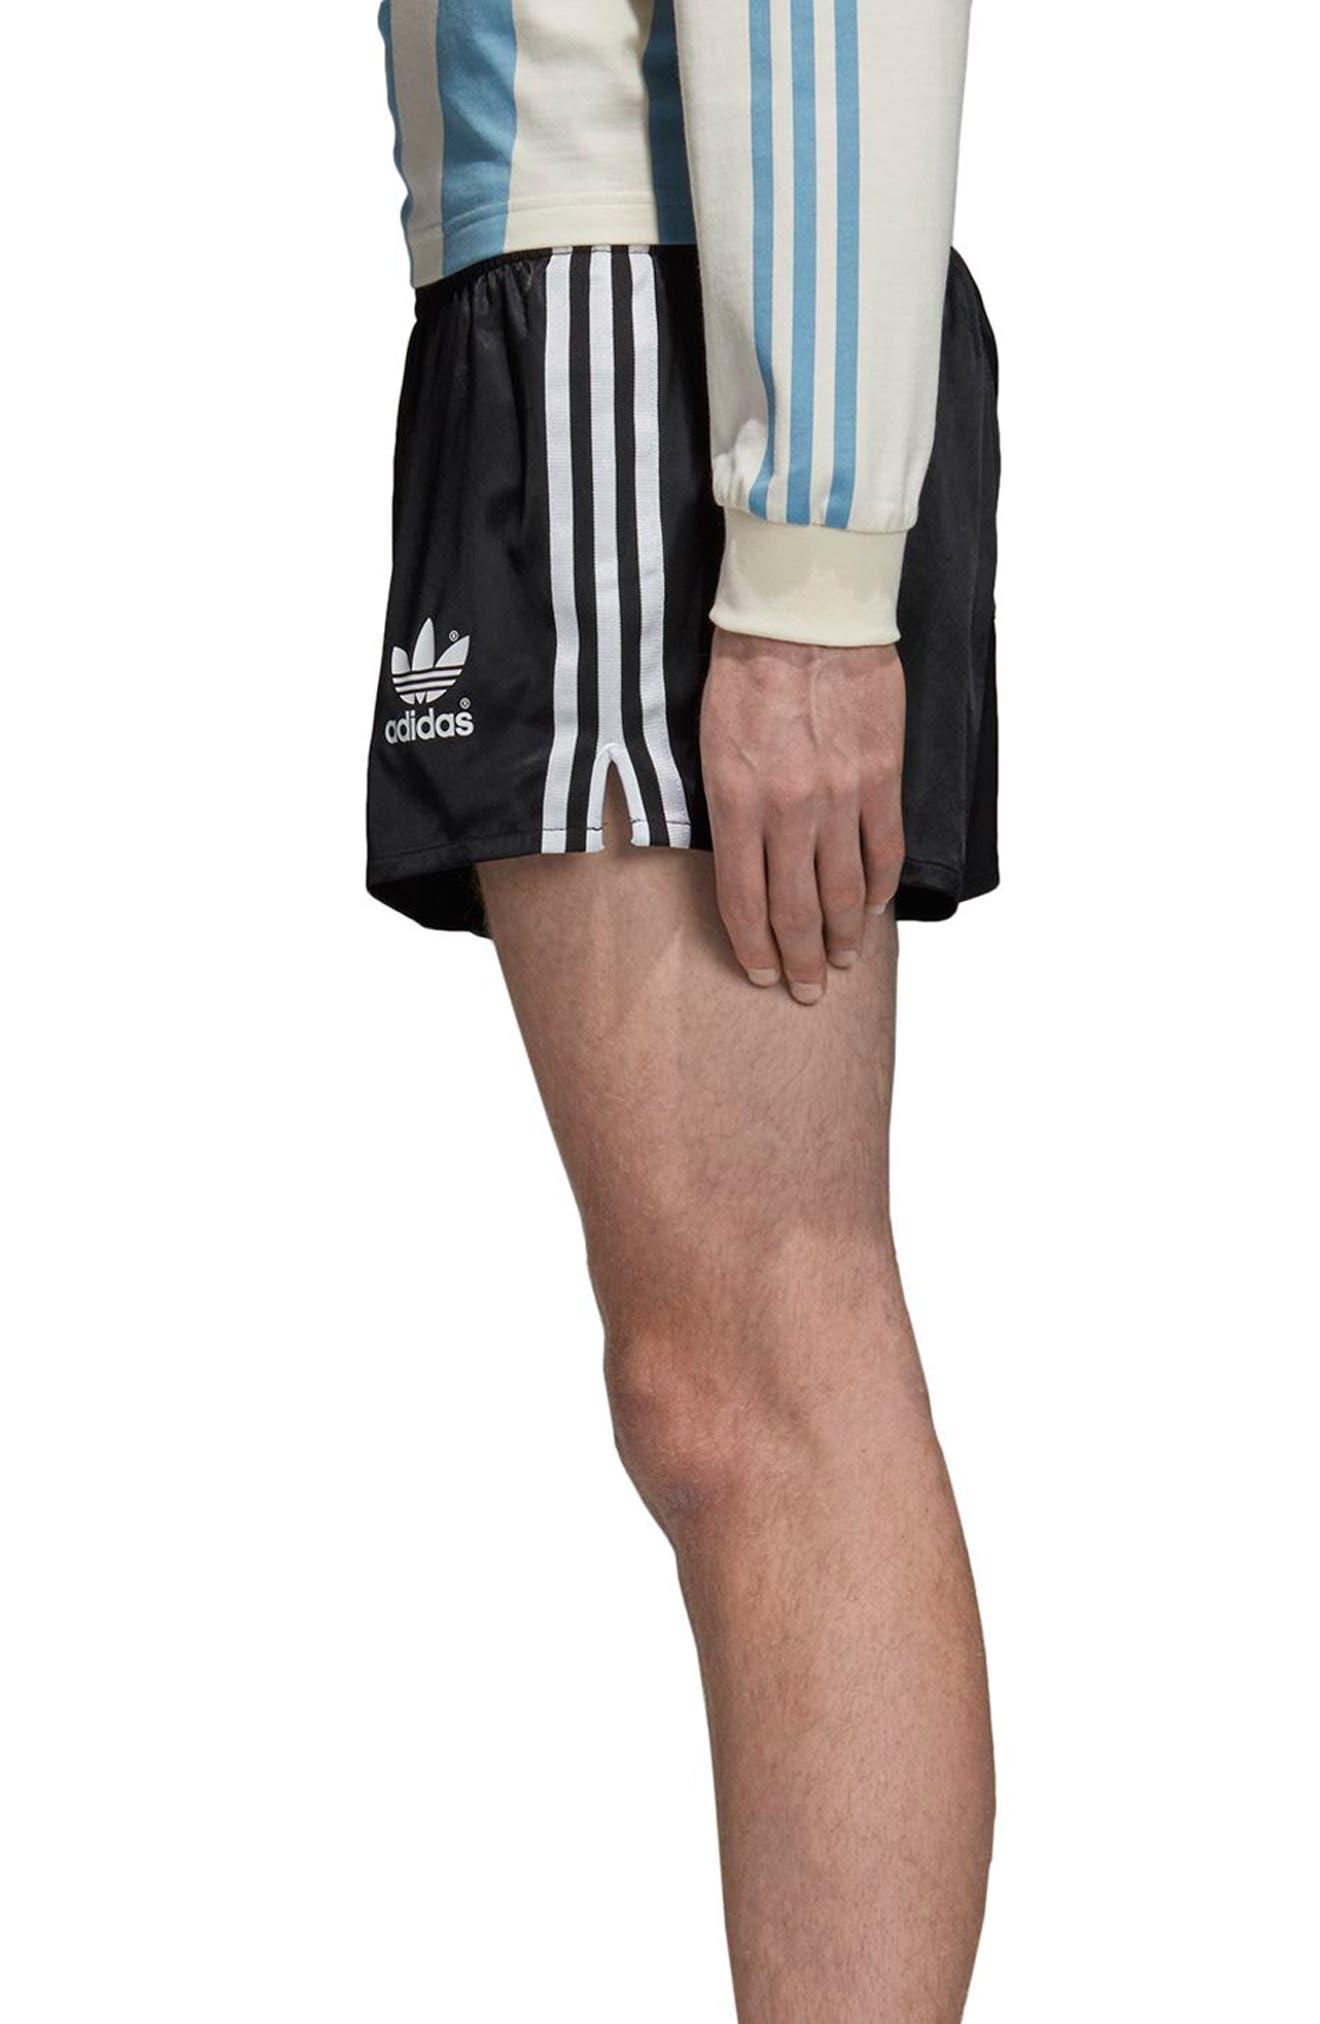 adidas Original Argentina 1987 Shorts,                             Alternate thumbnail 3, color,                             Black